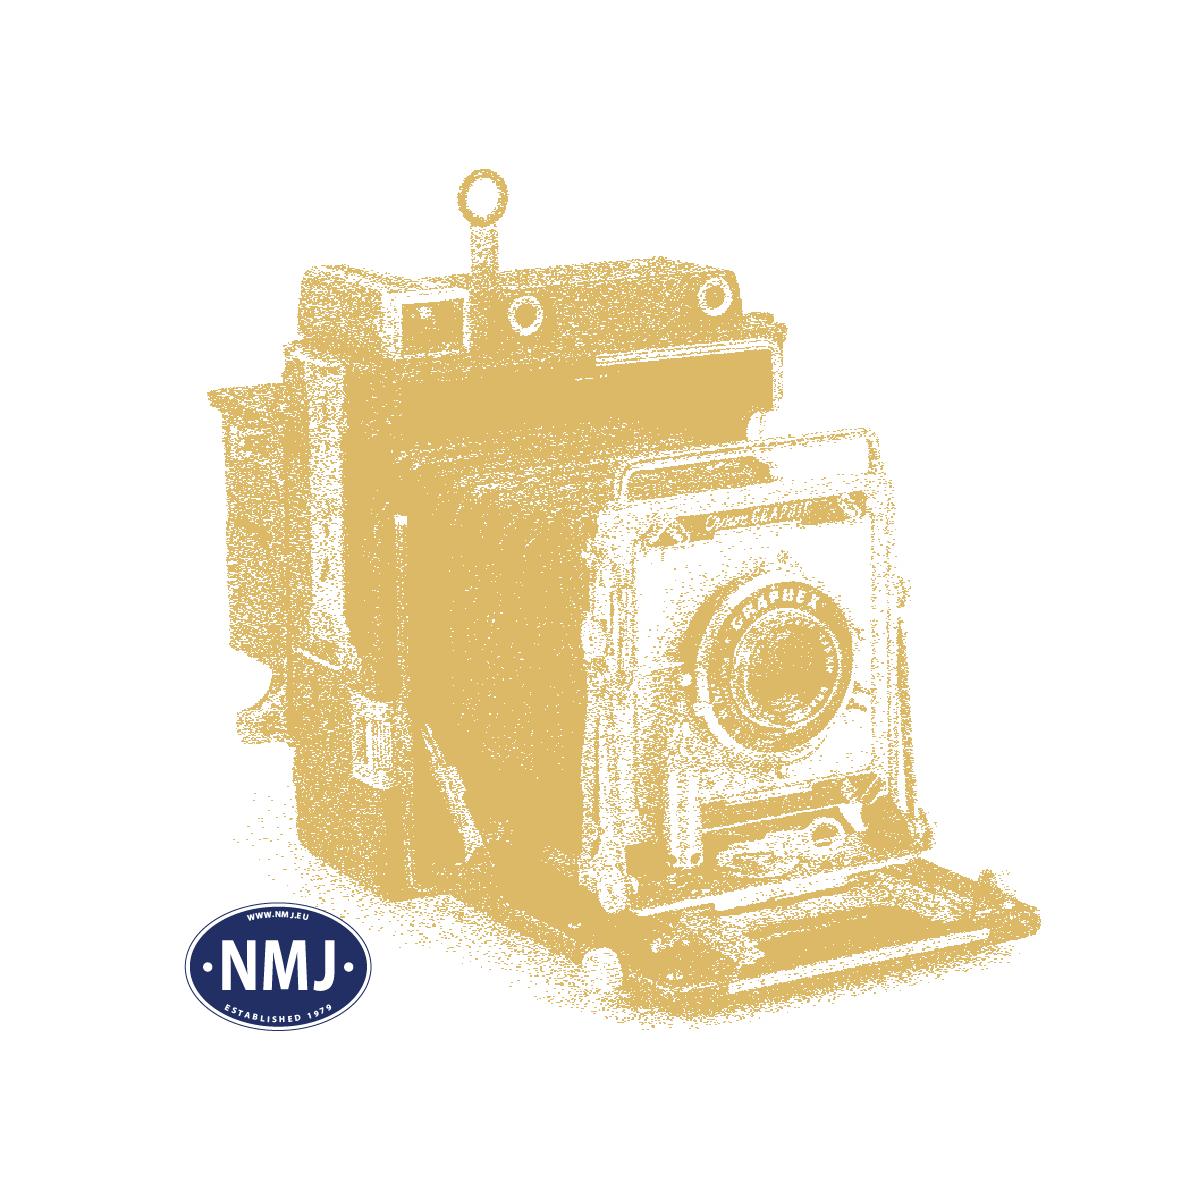 NMJT90210 - NMJ Topline MAV M61.013, DCC w/ Sound